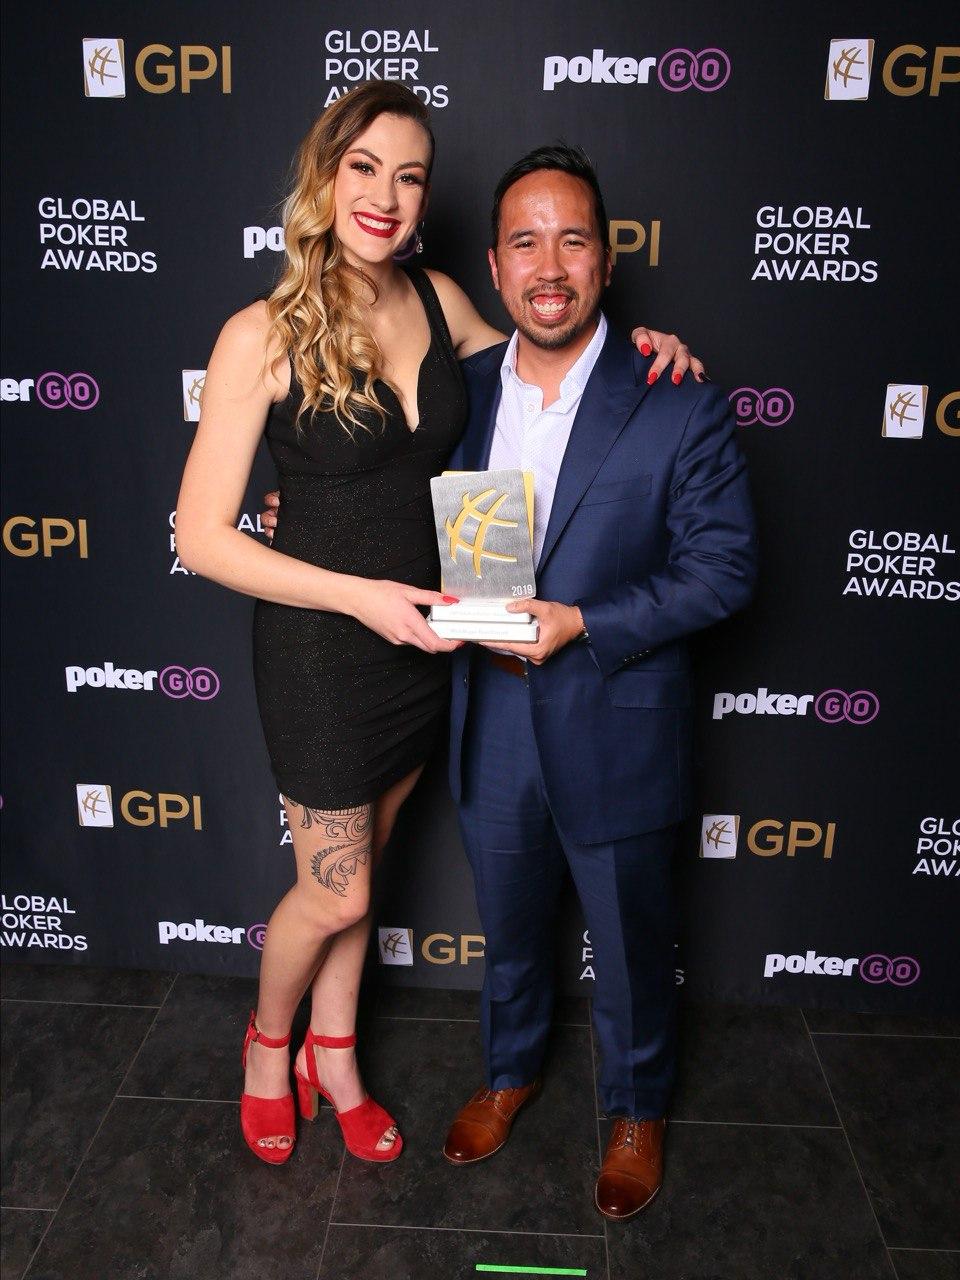 RunGood best mid major GPI award